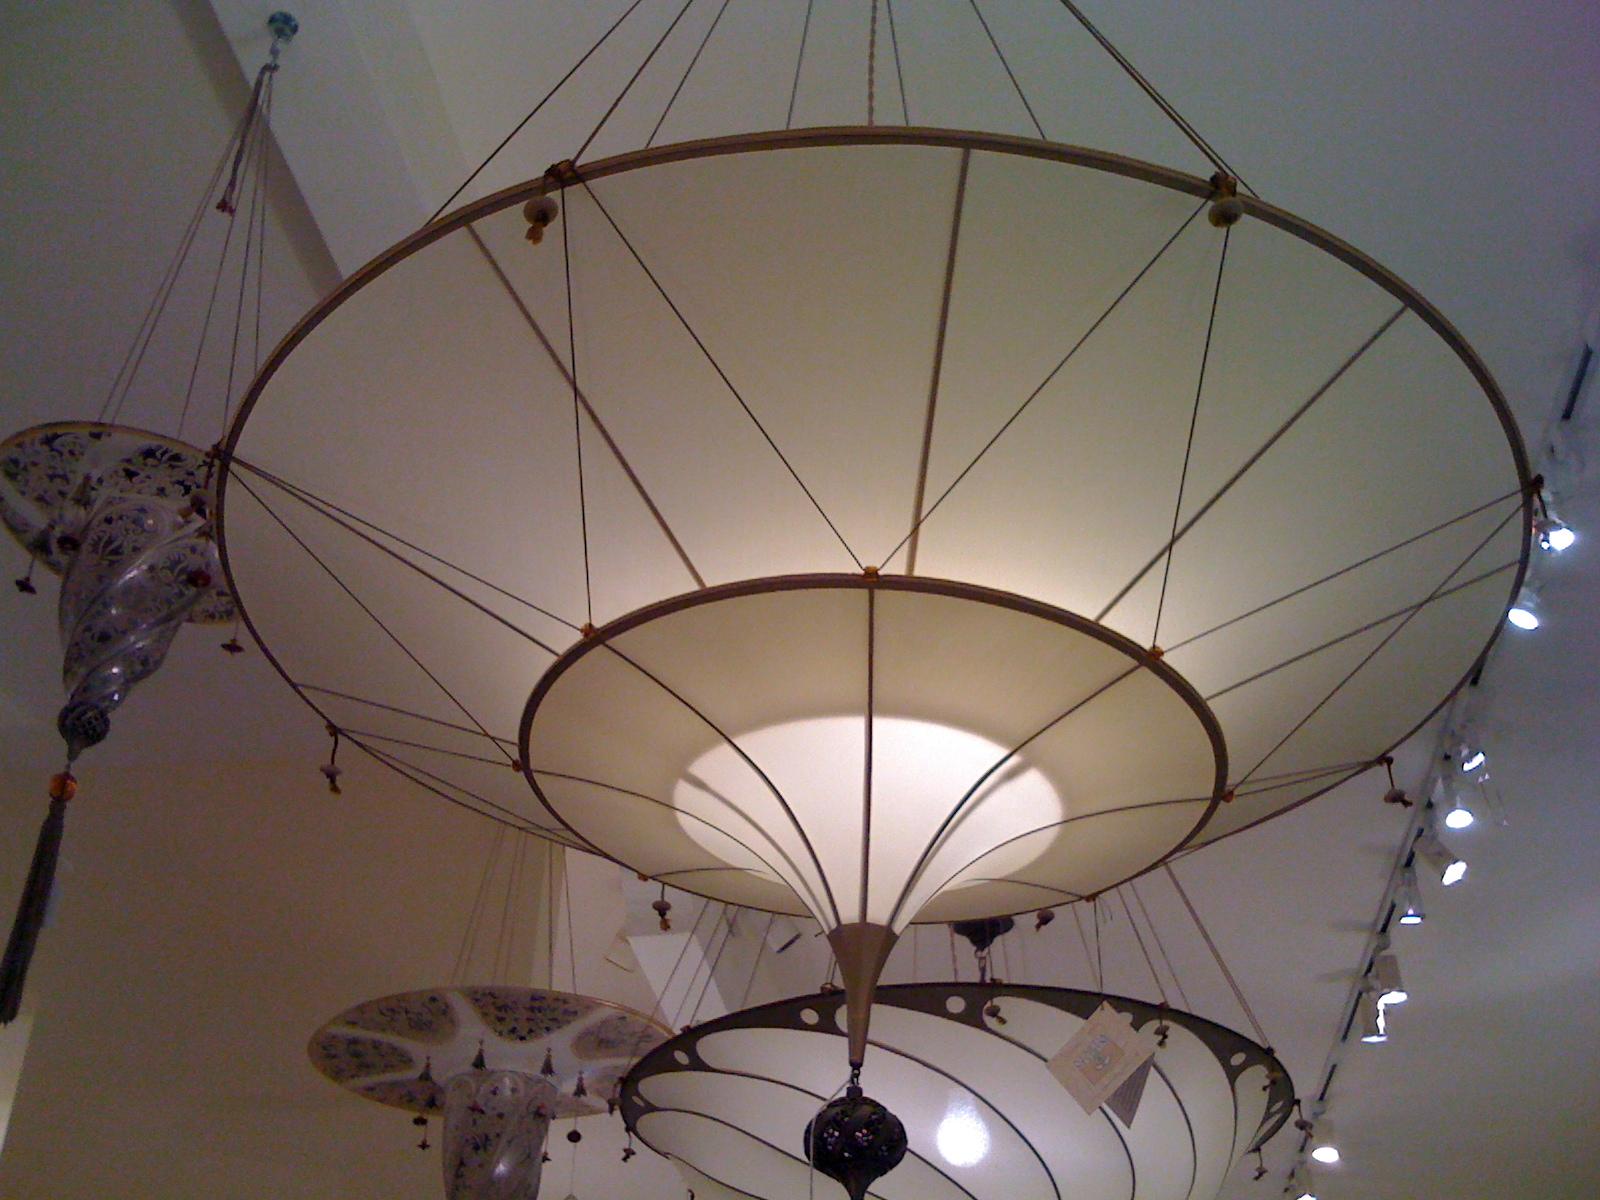 les inspirational du gallery lights images on style meilleures fortuny of chandelier tableau lighting sur pinterest best